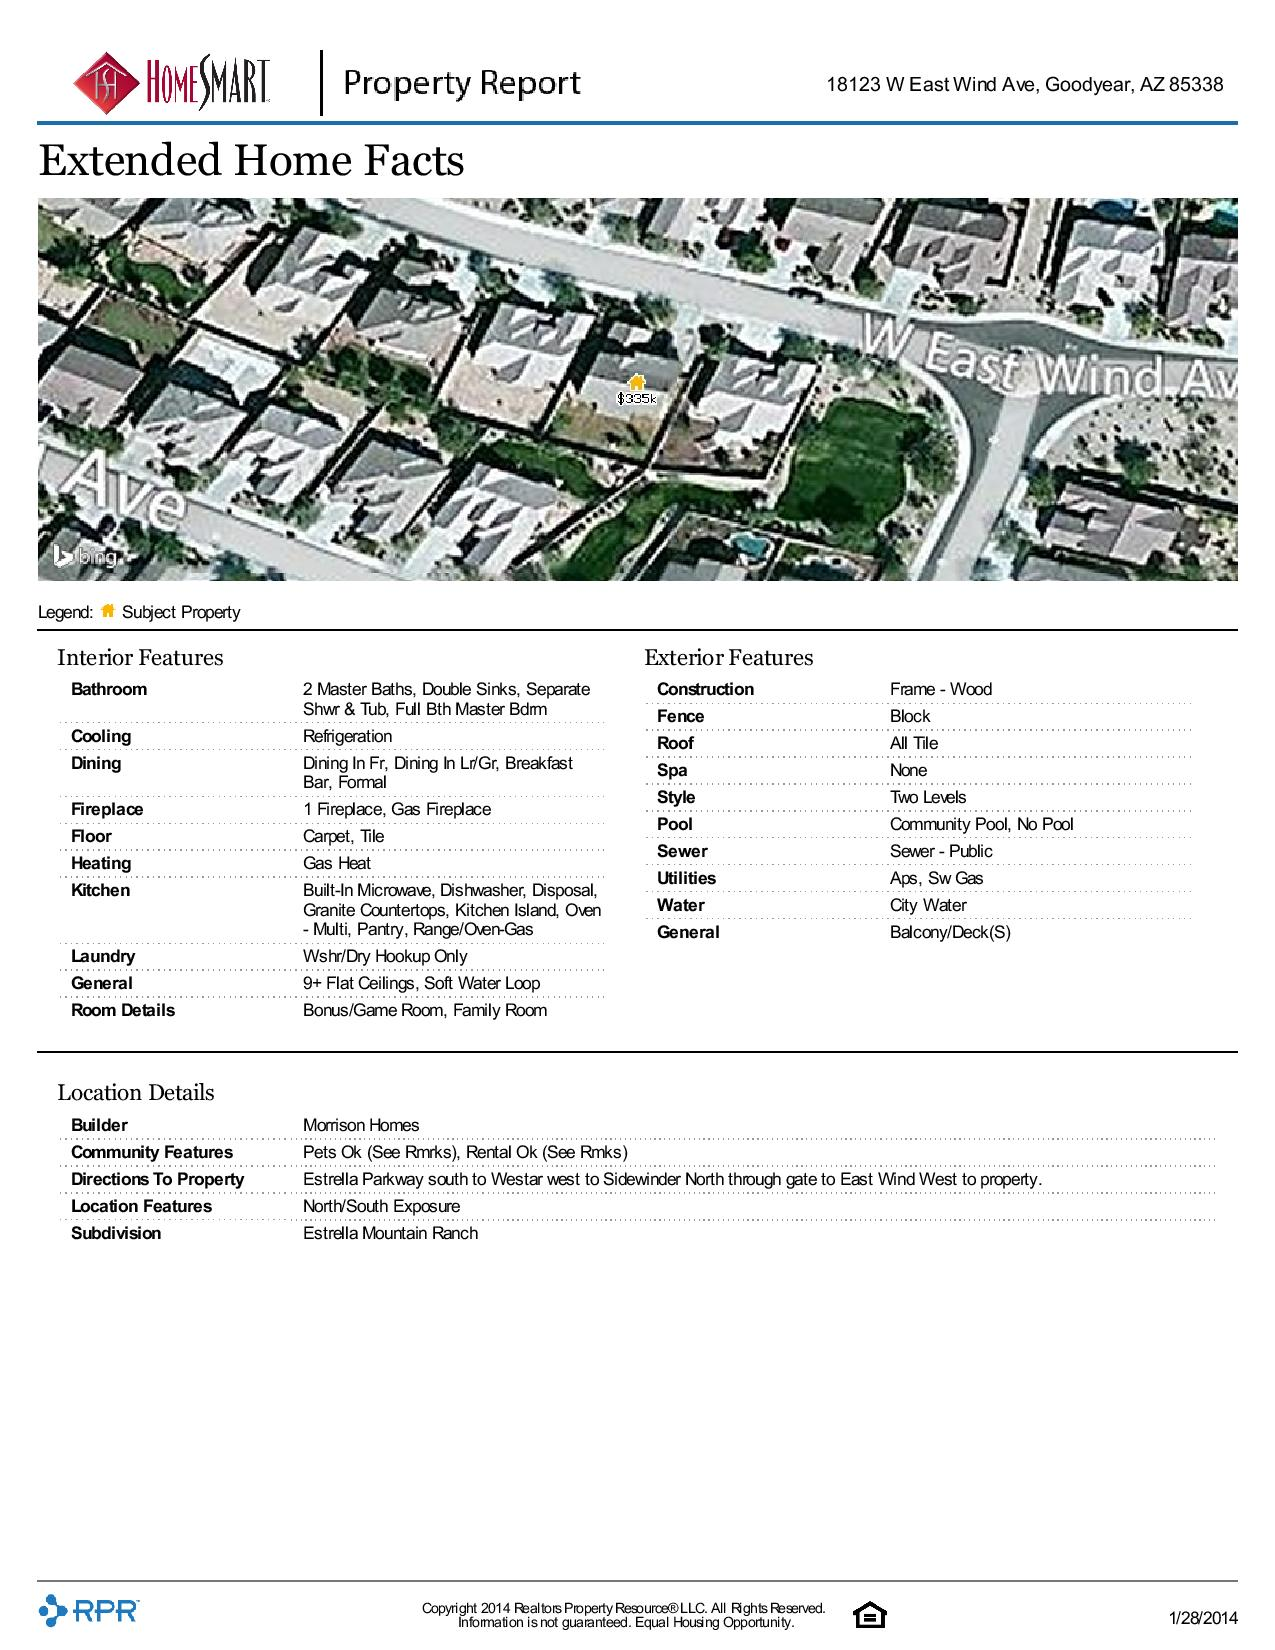 18123-W-East-Wind-Ave-Goodyear-AZ-85338.pdf-page-004